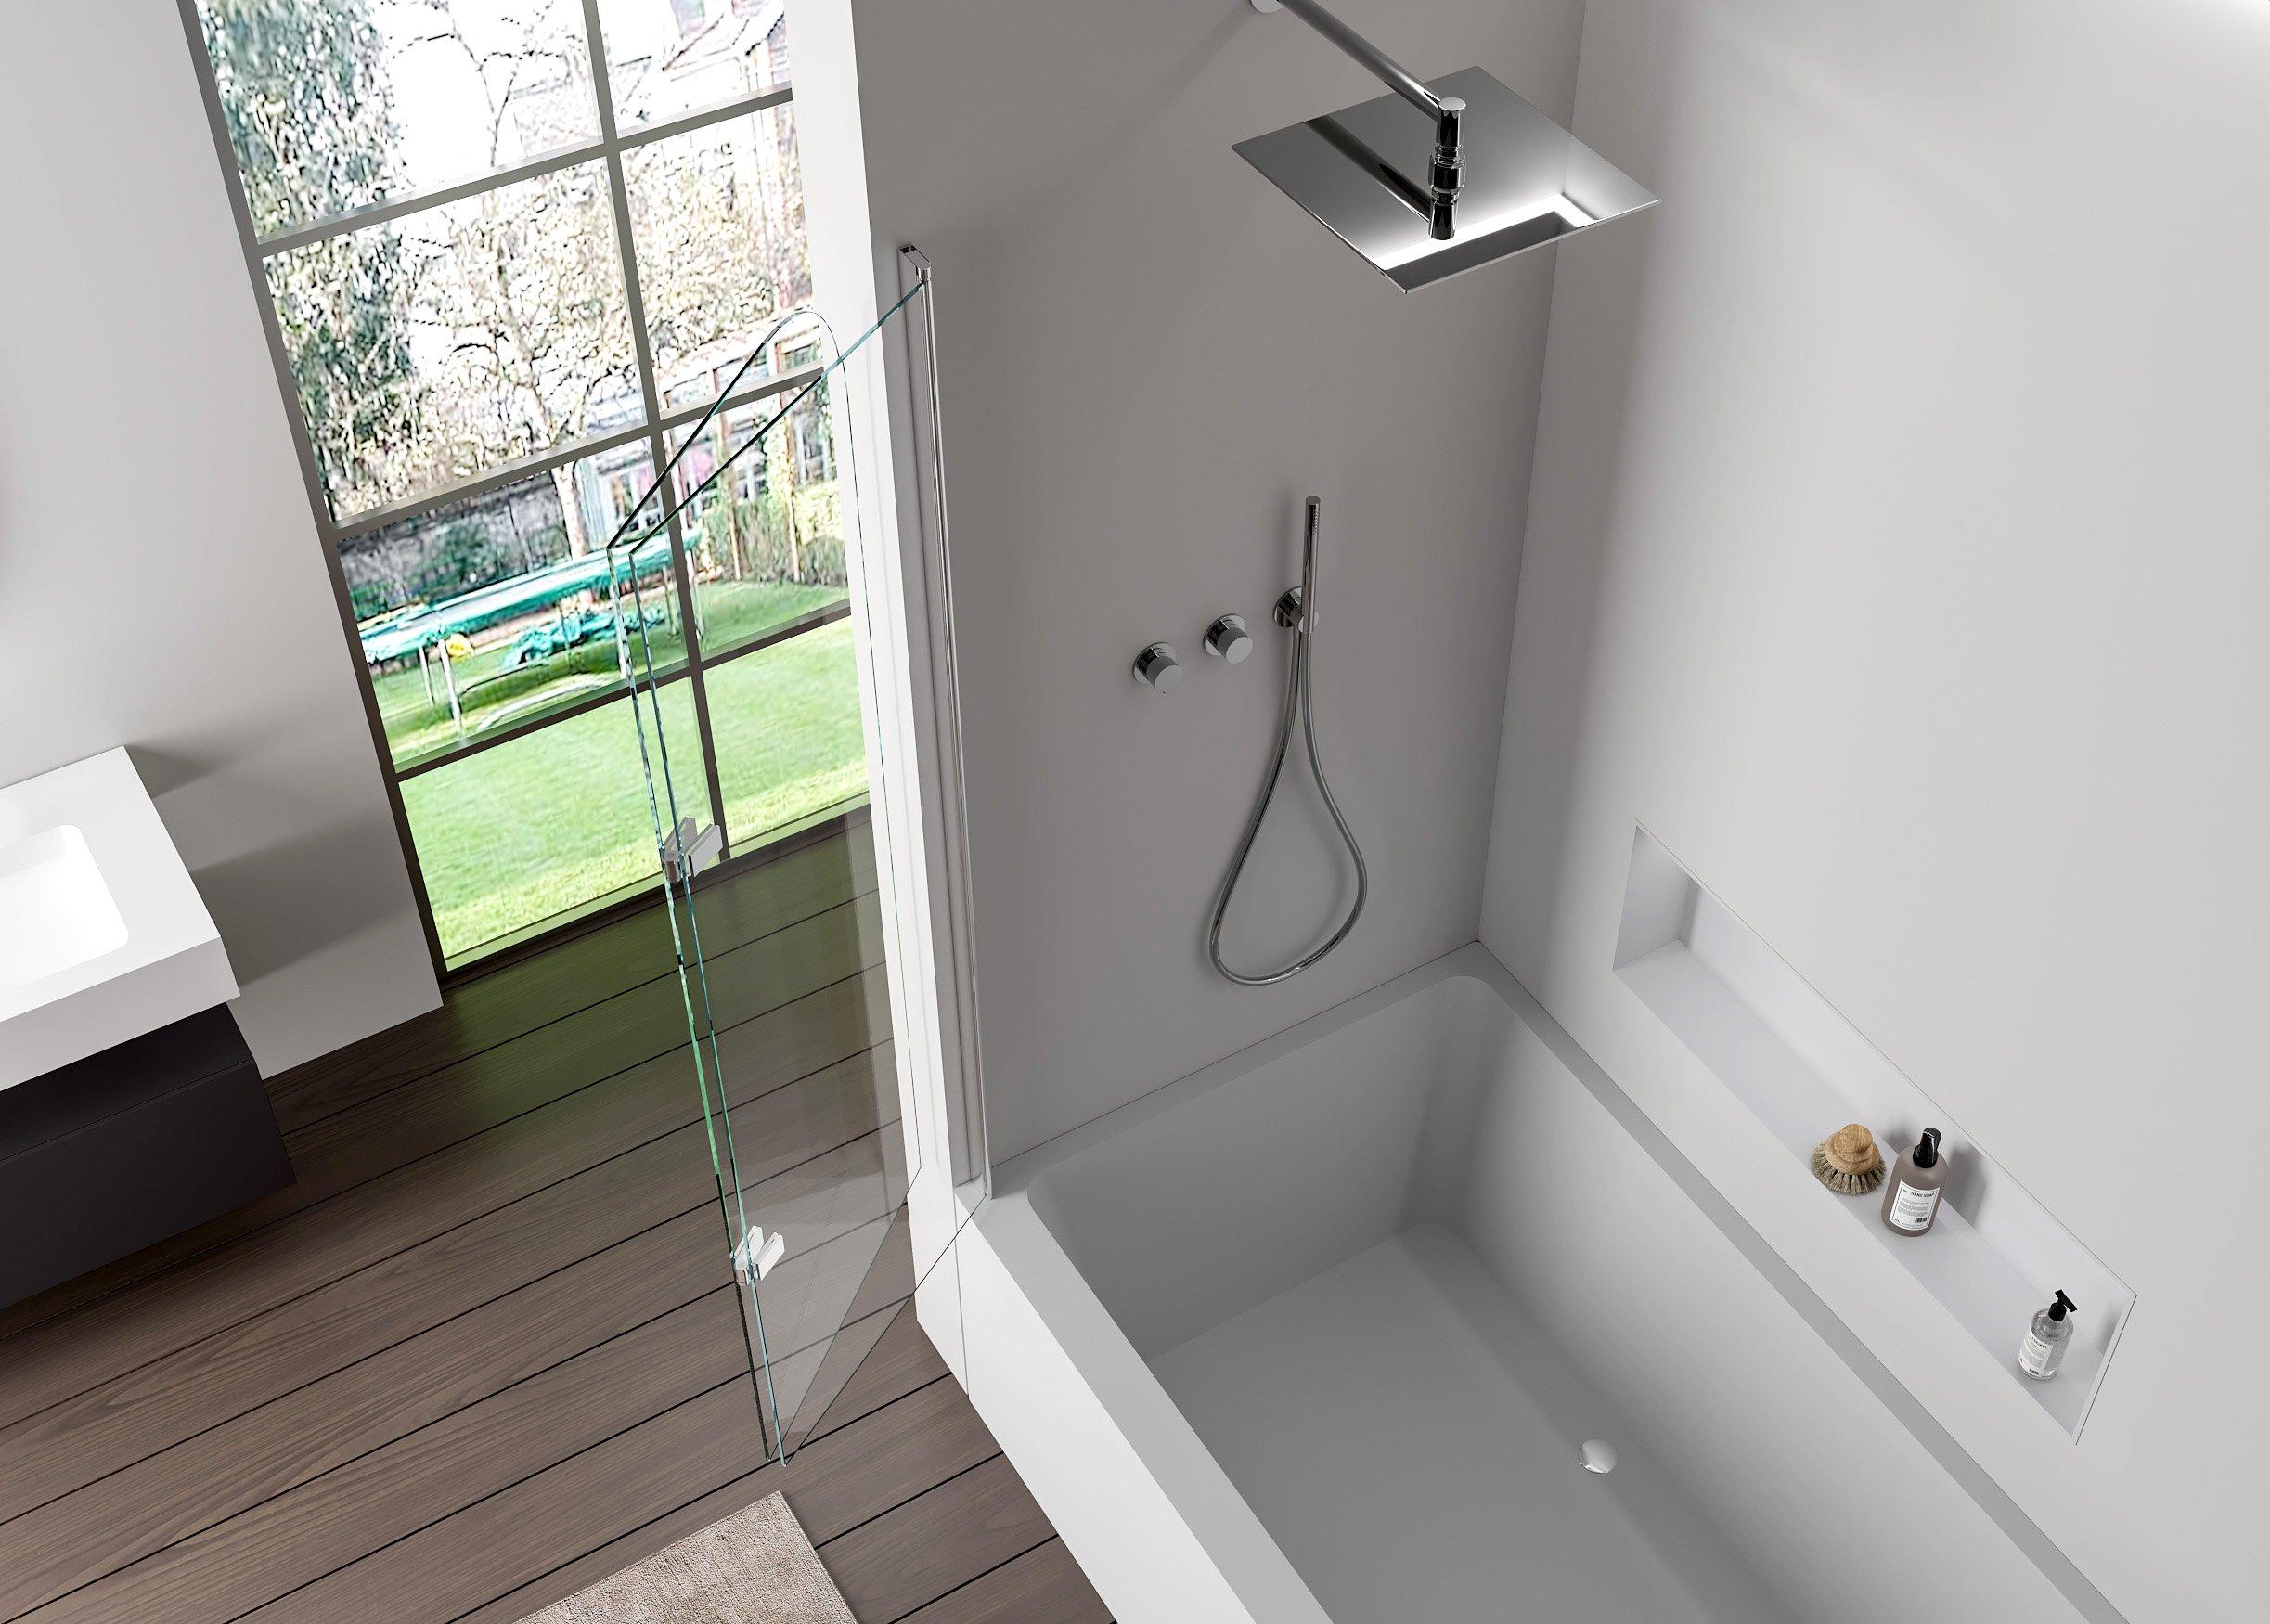 Duschabtrennung Duschwand Badewanne Nano Echtglas EX209 - 1200 x 1400 x 6 mm zoom thumbnail 3